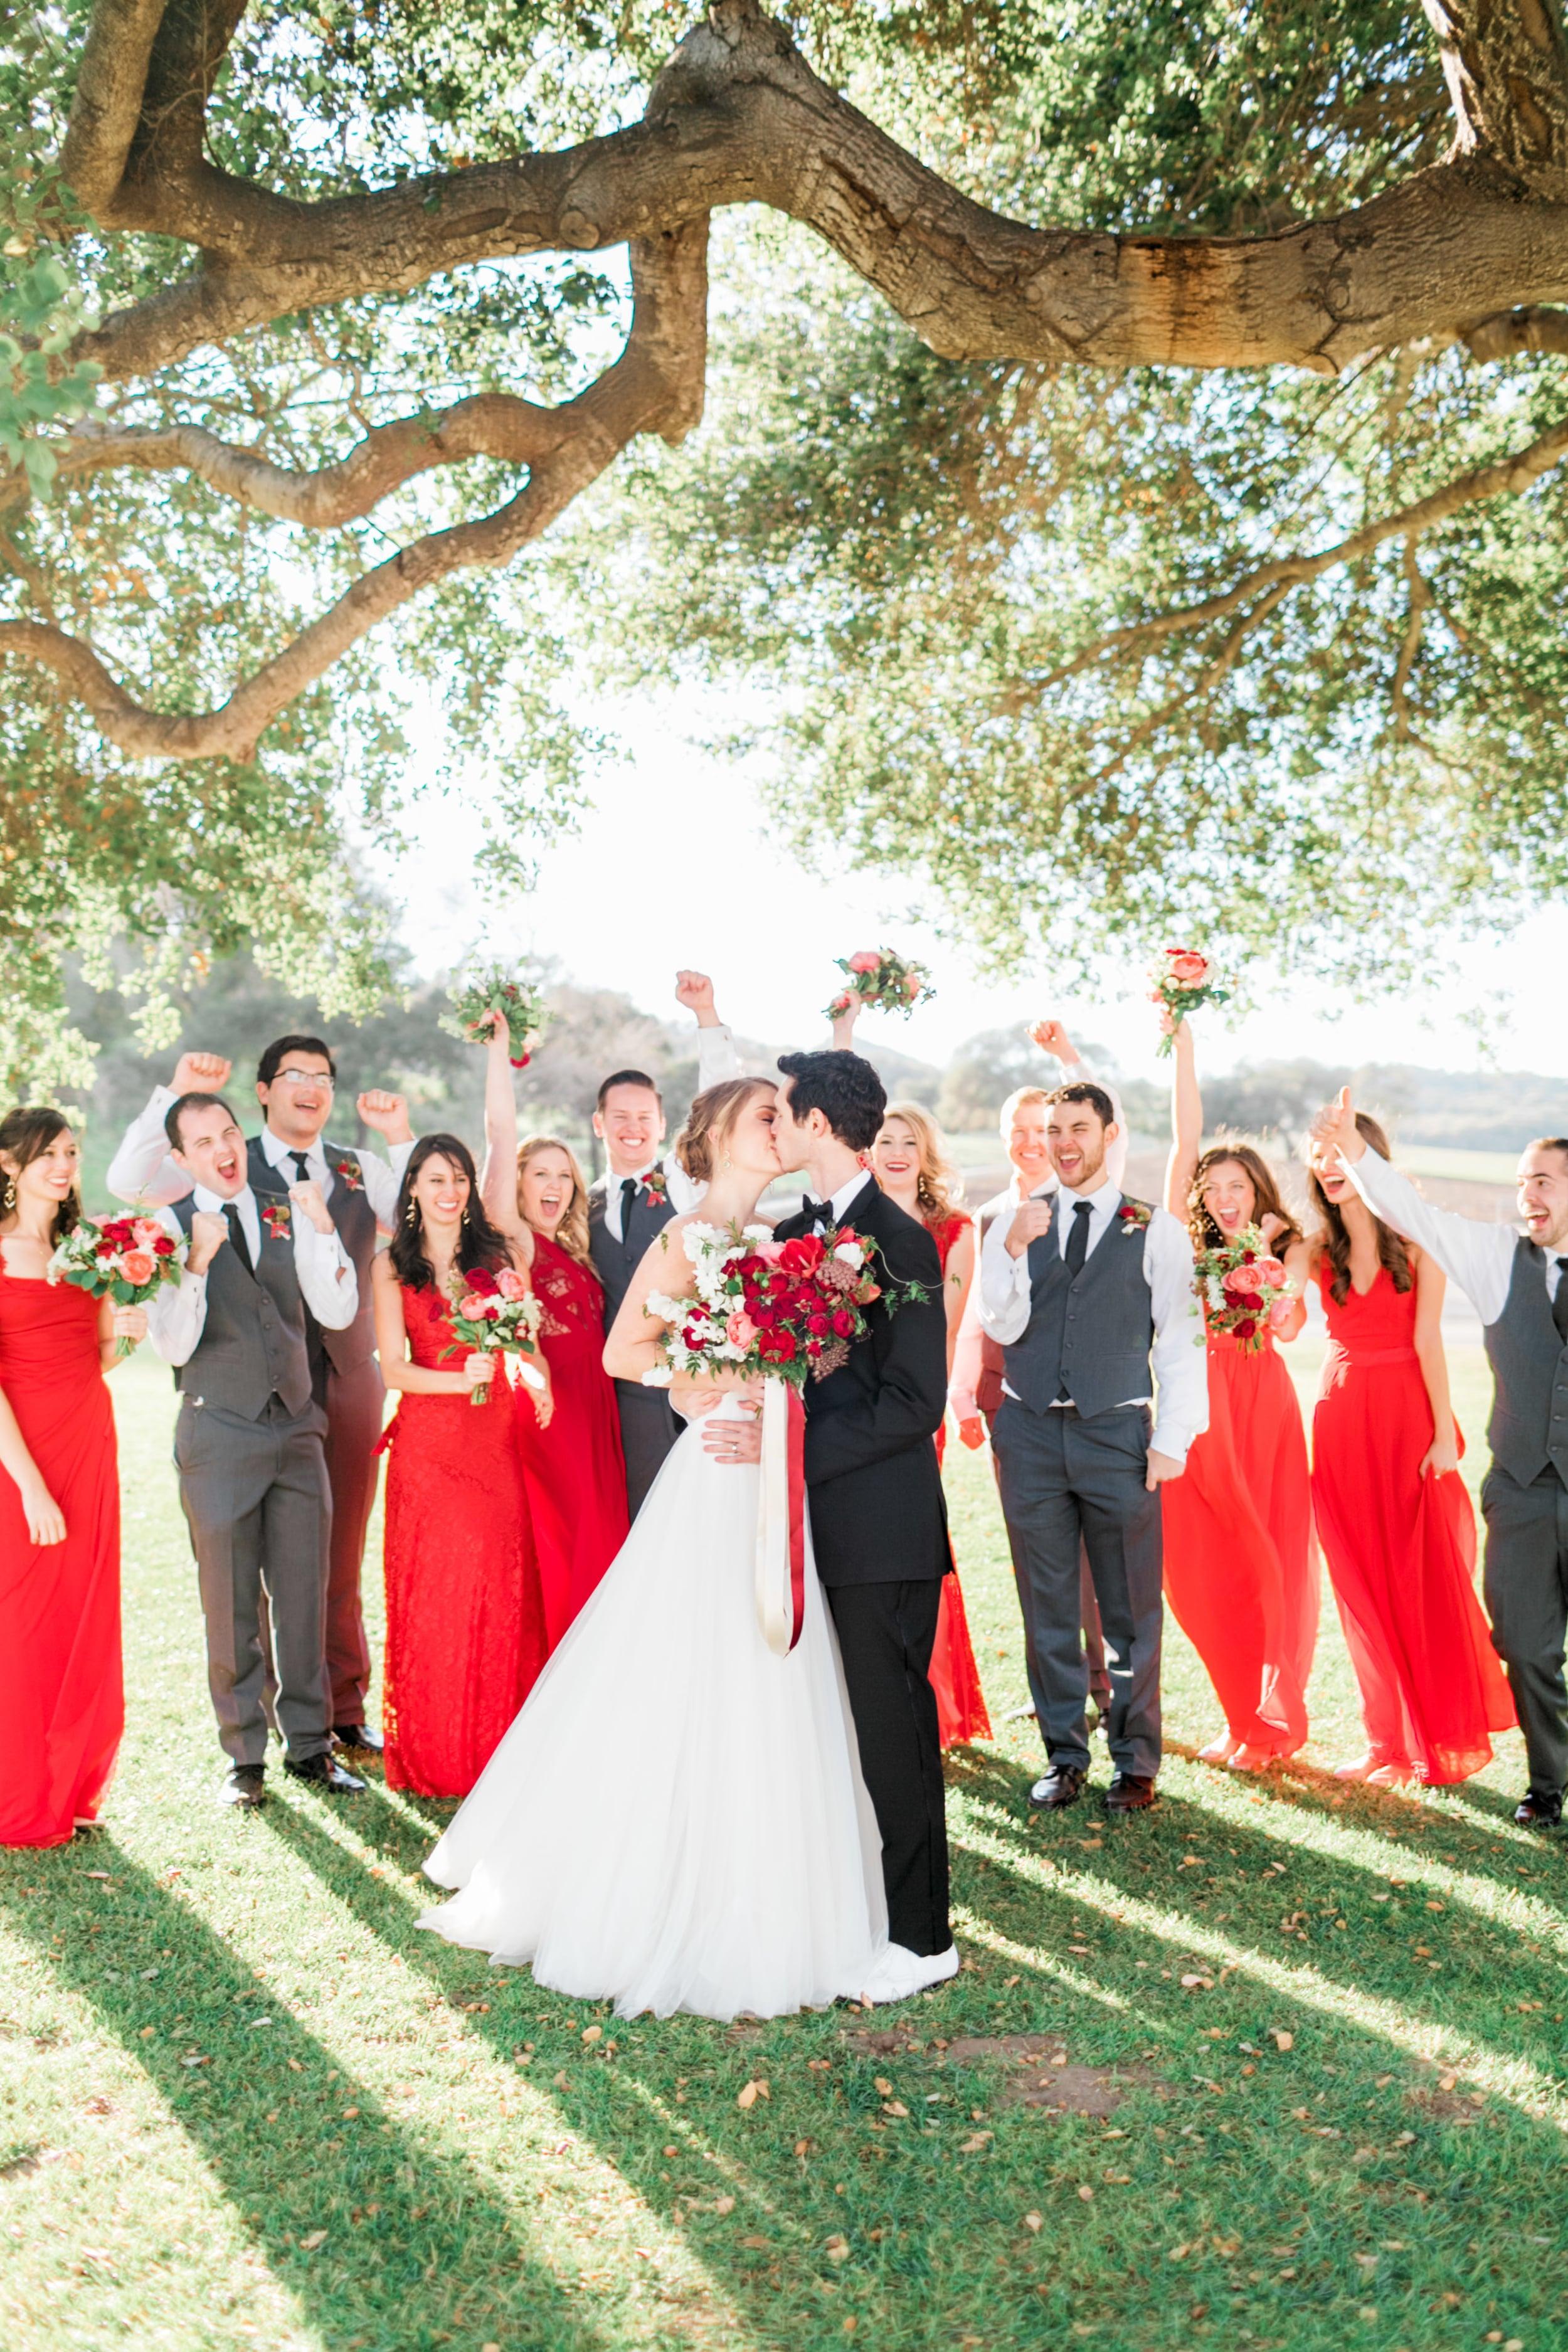 Natalie_Schutt_Photography_Winter_Wedding_San_Luis_Obispo-158.jpg